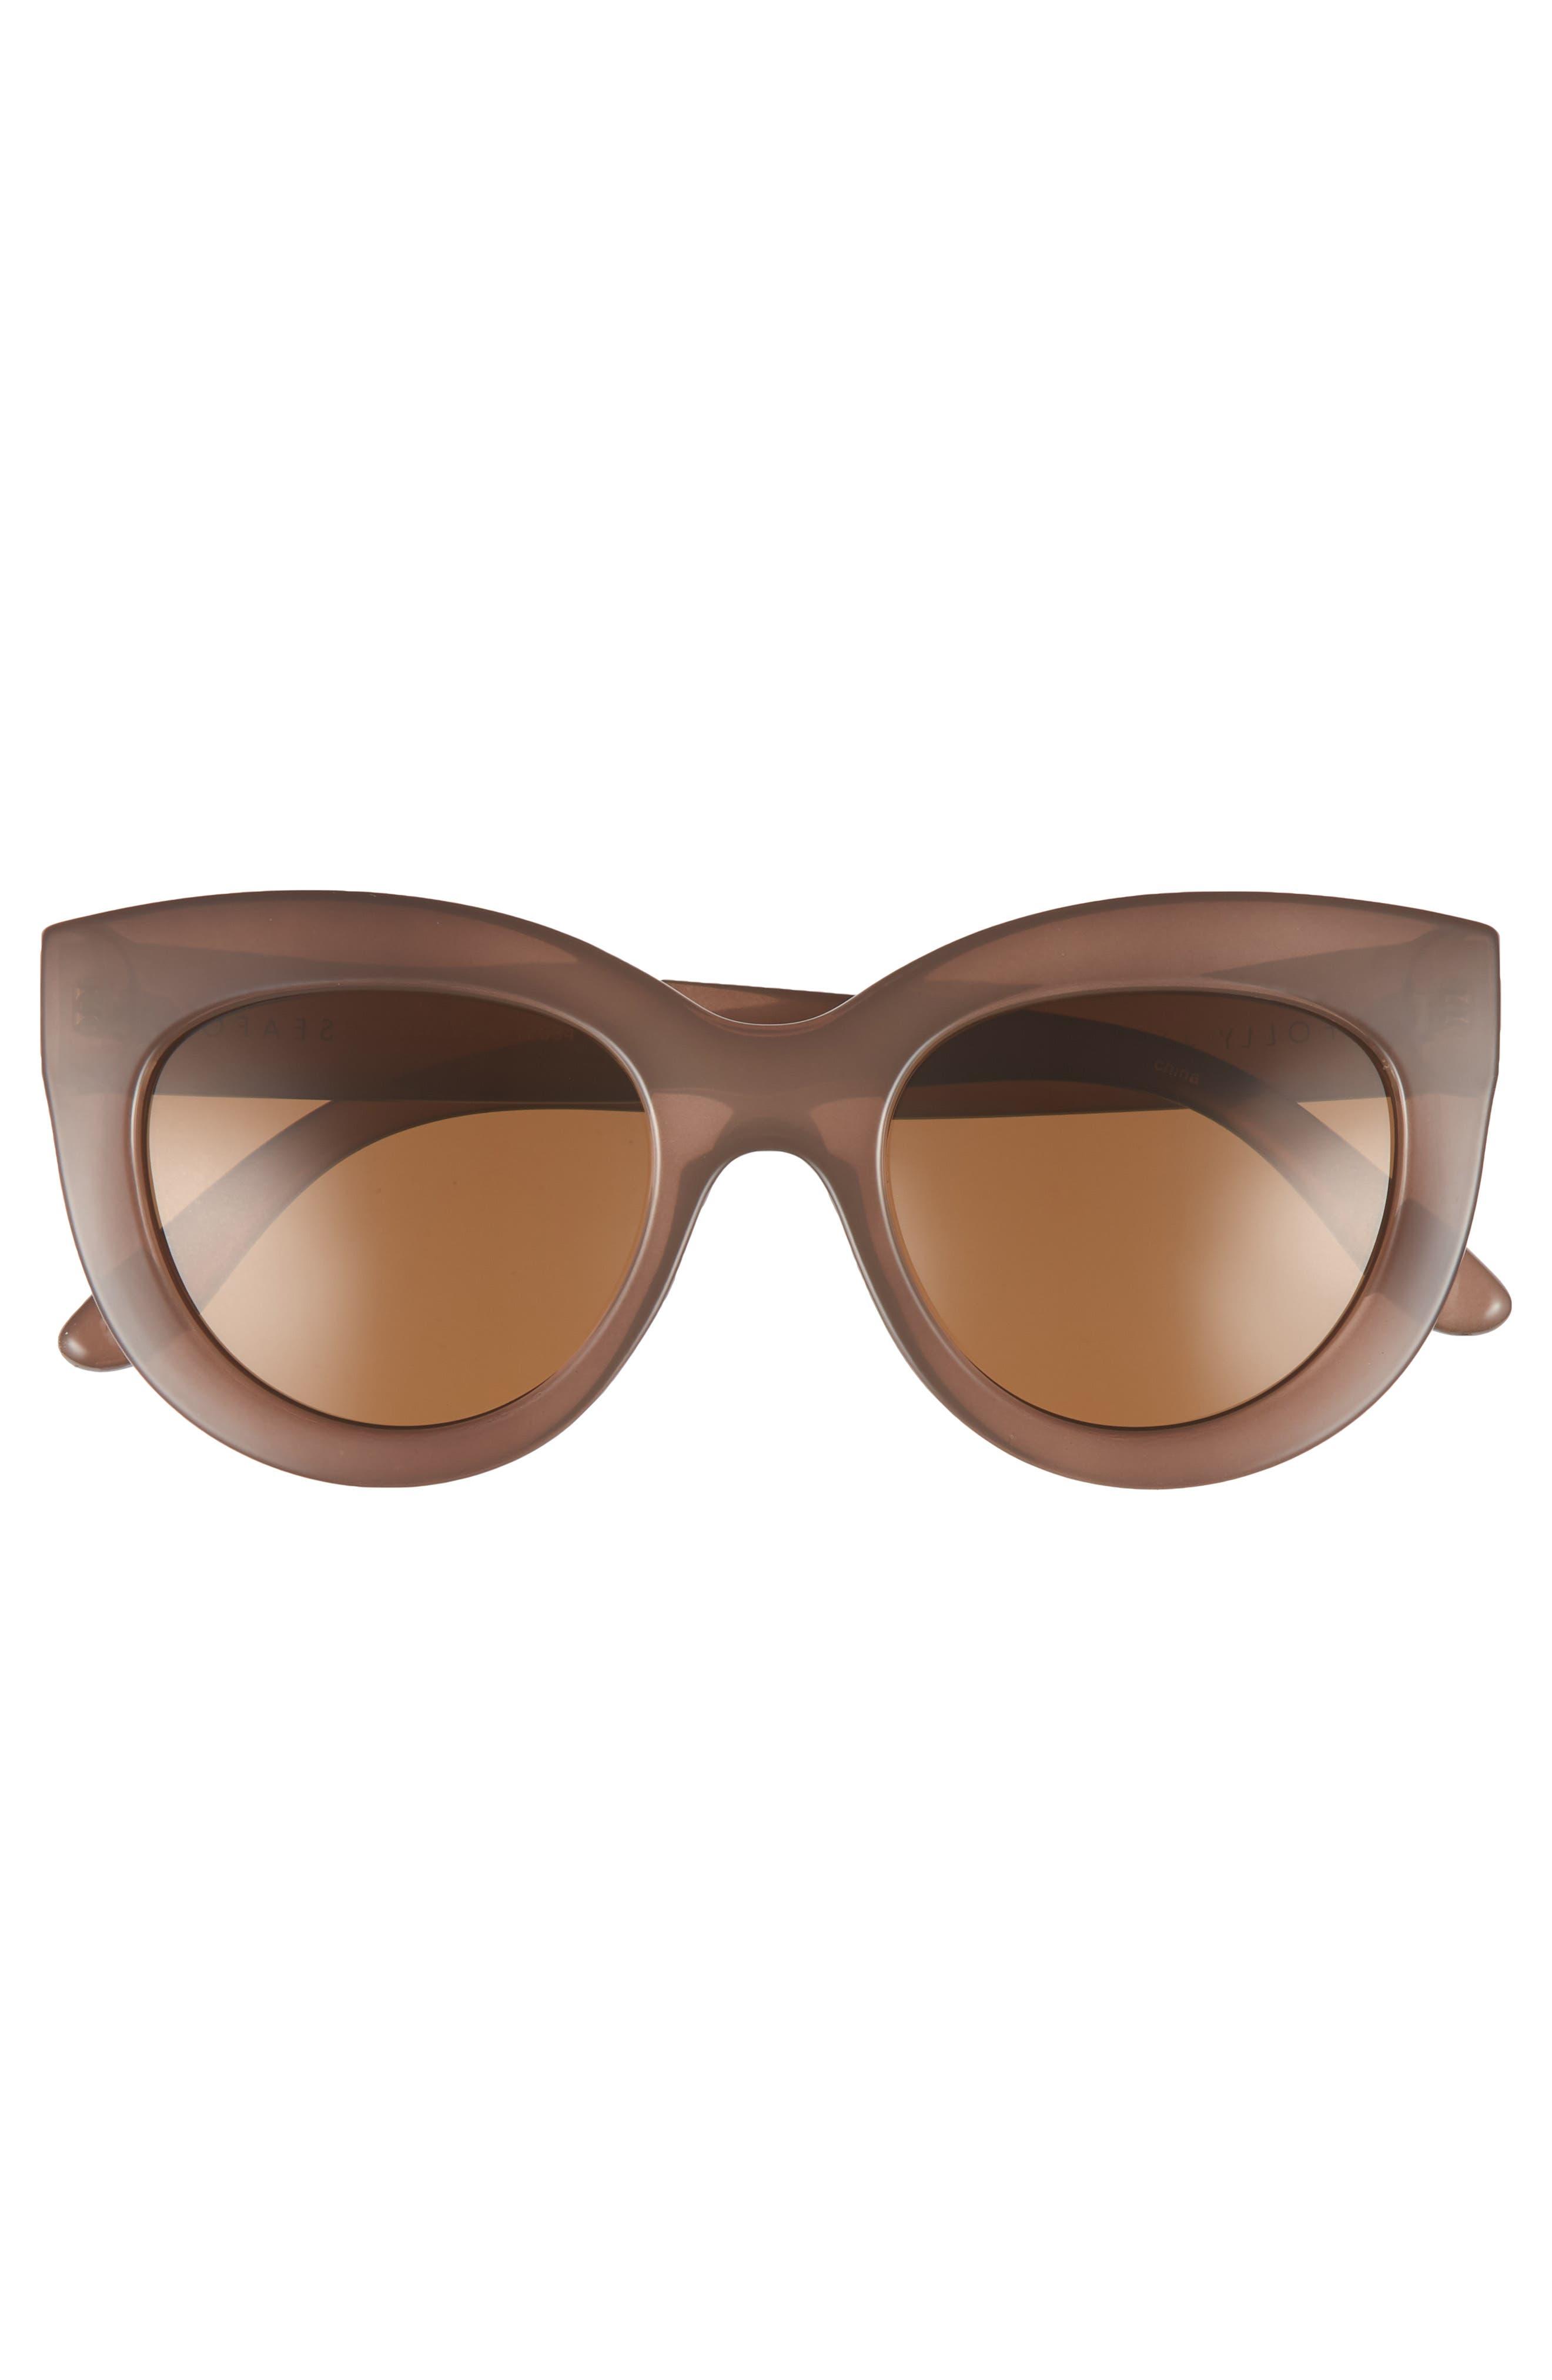 Tortola V2 51mm Polarized Cat Eye Sunglasses,                             Alternate thumbnail 3, color,                             200